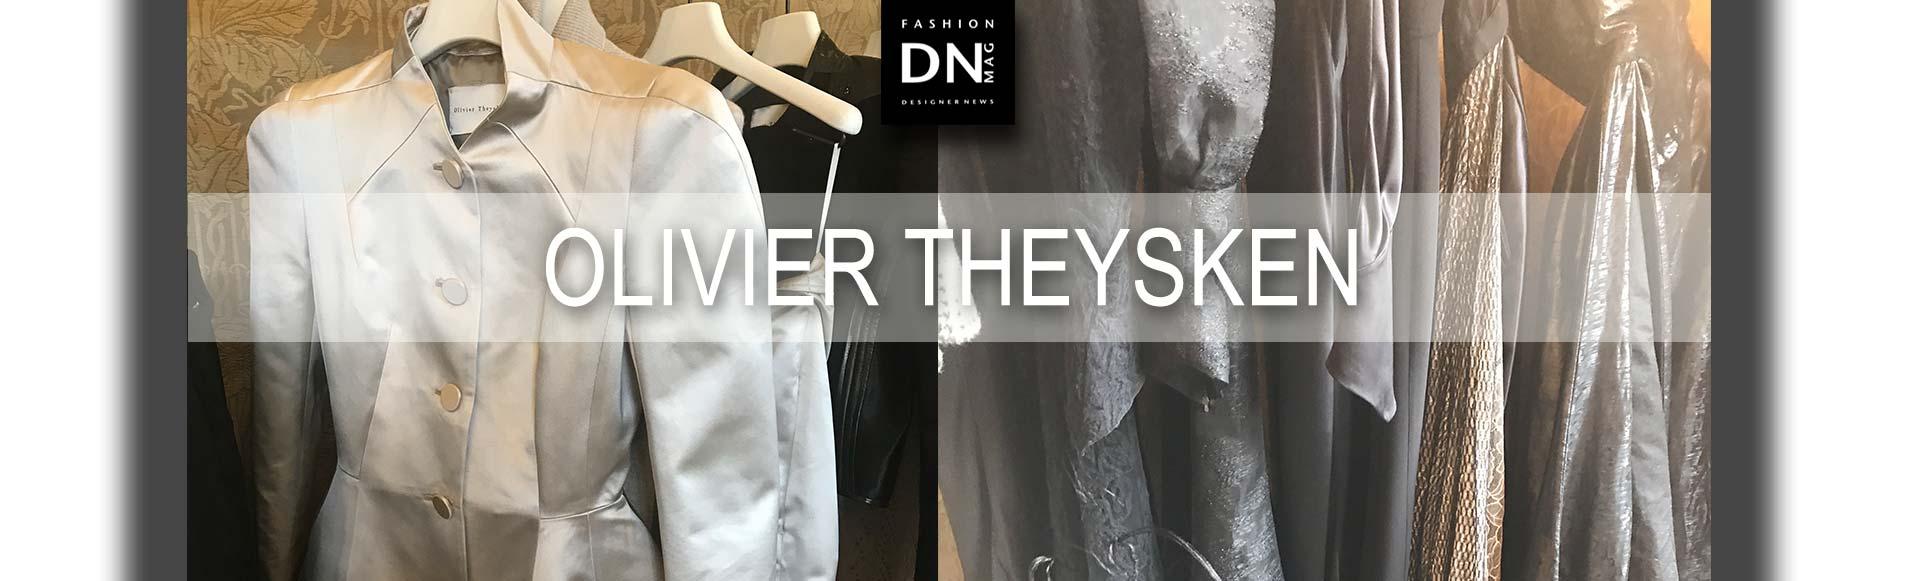 DNMAG-OLIVIER-THEYSKEN-RTW19-FALL19-20